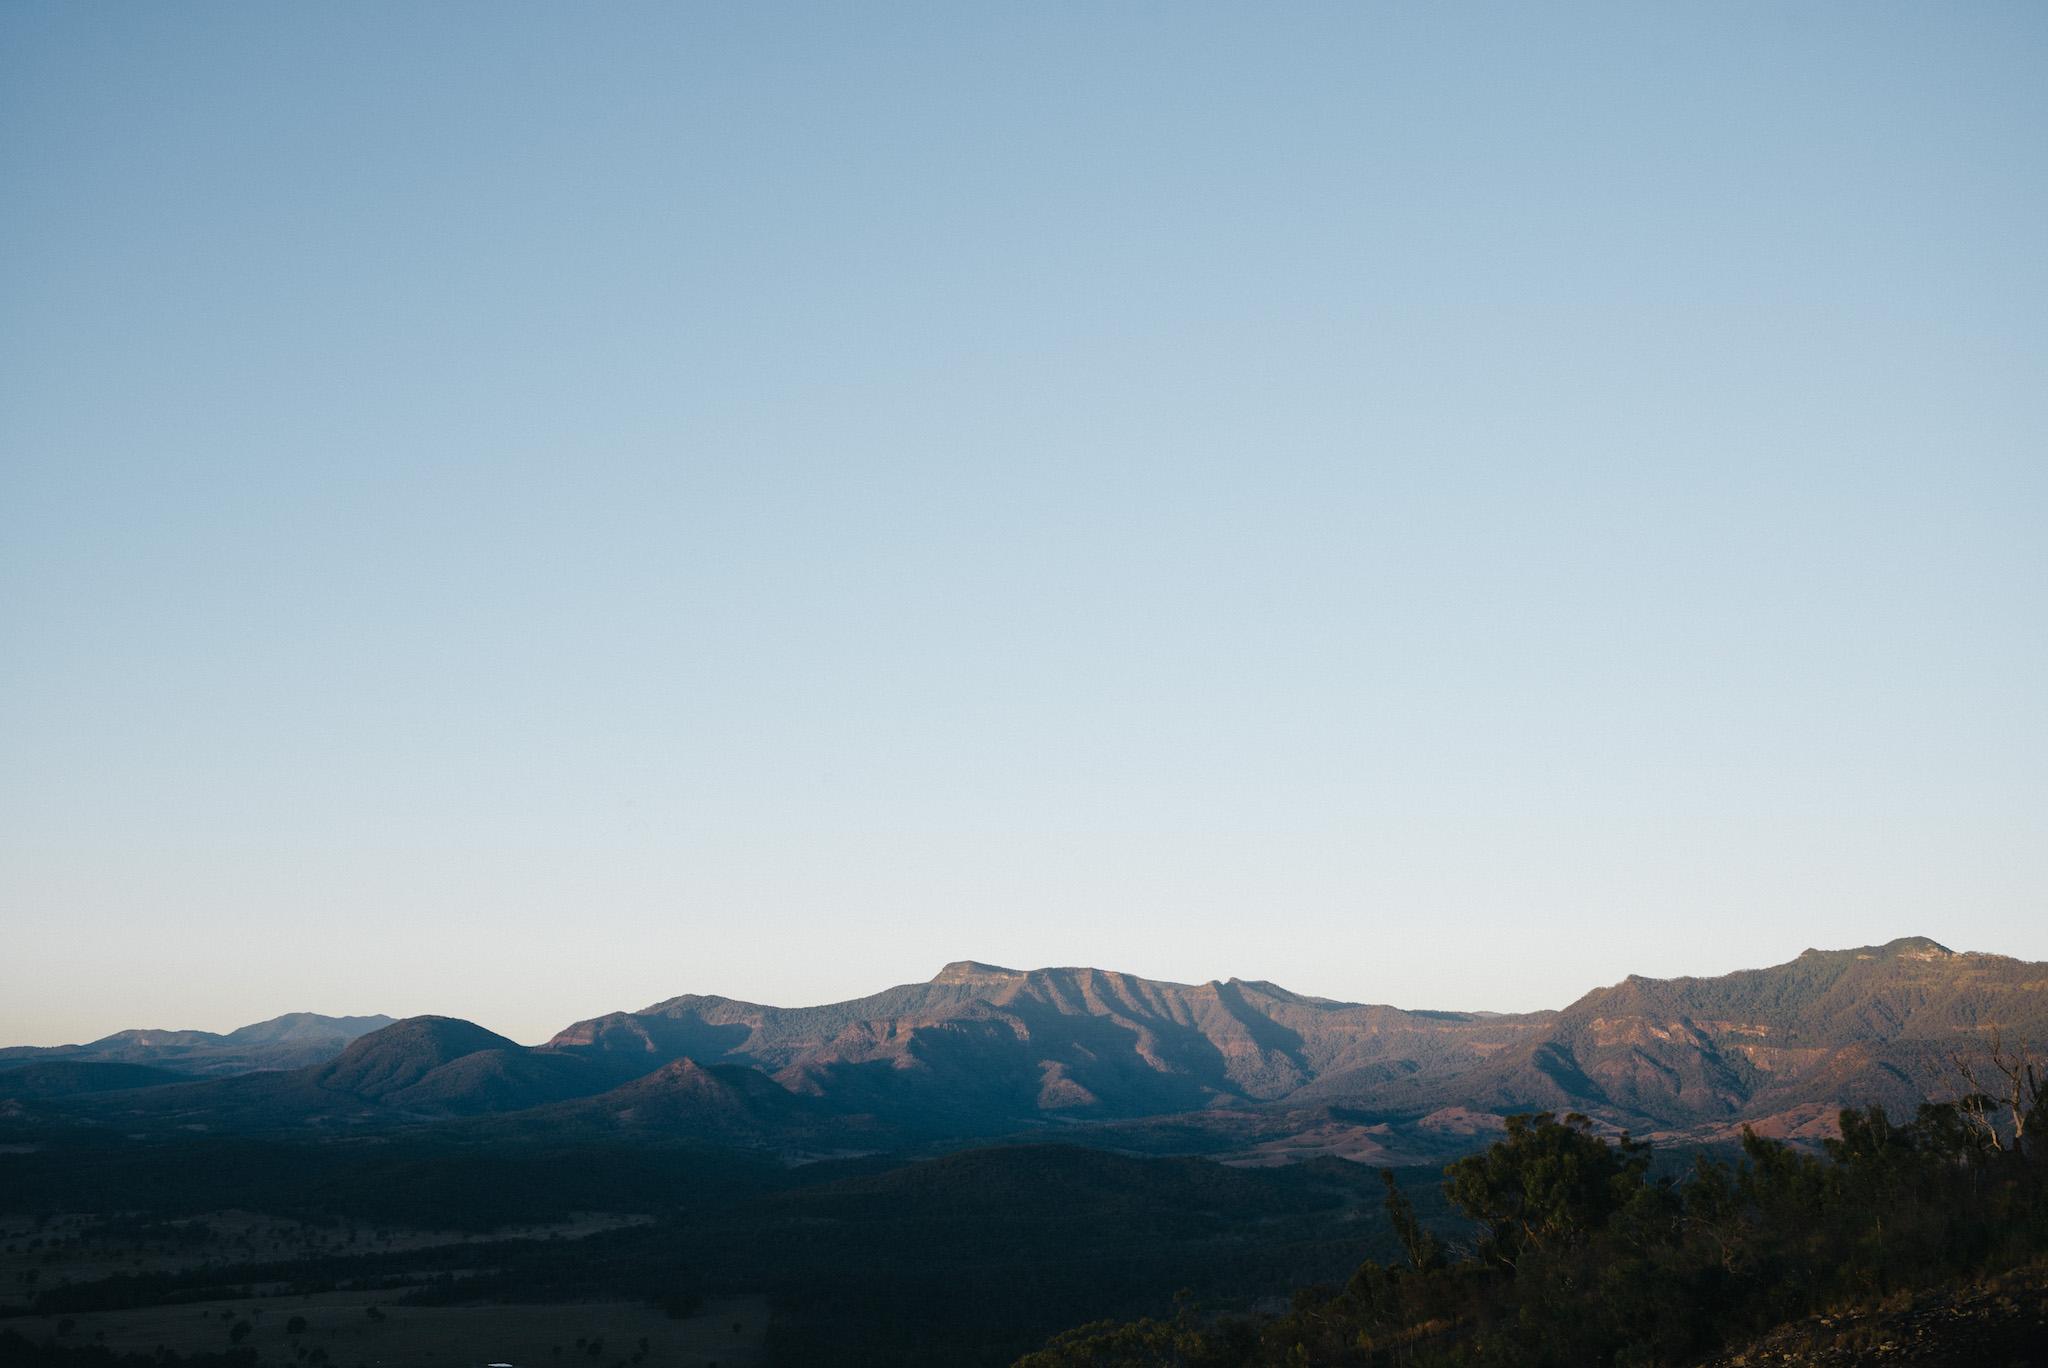 Main range including Mount Roberts, Queensland, seen from eastern slopes of Mount Greville.